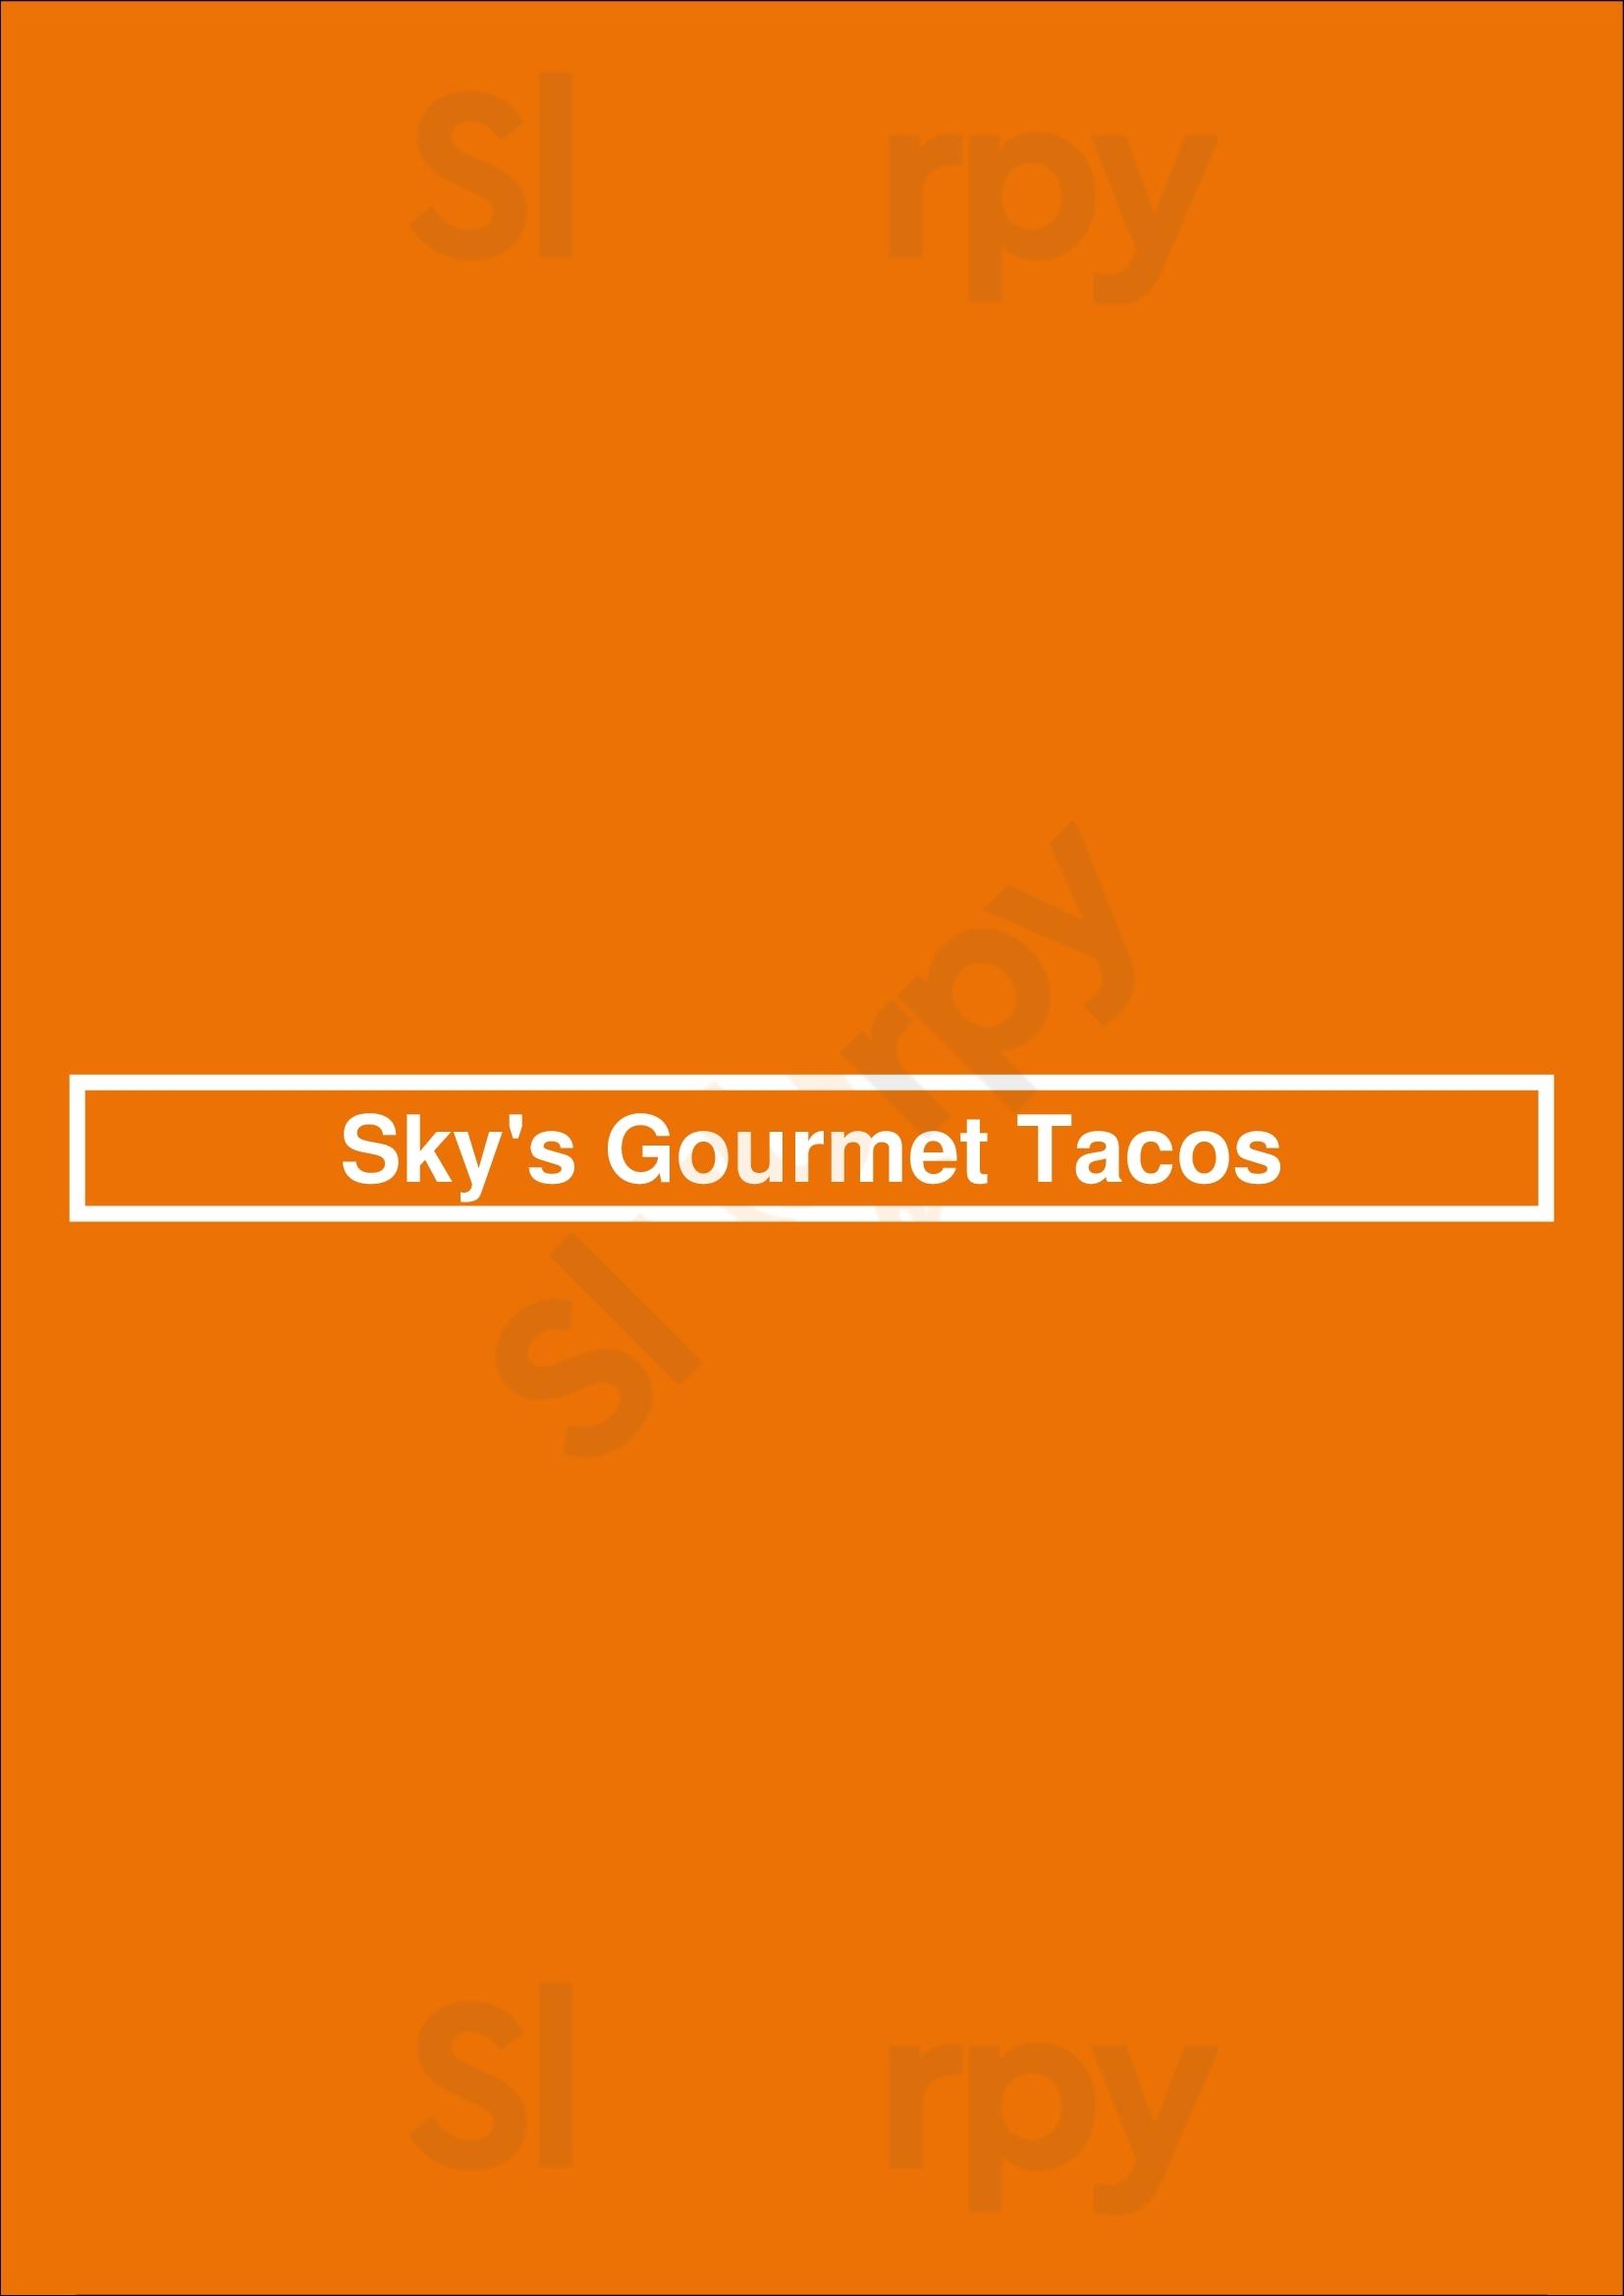 Sky's Gourmet Tacos Los Angeles Menu - 1